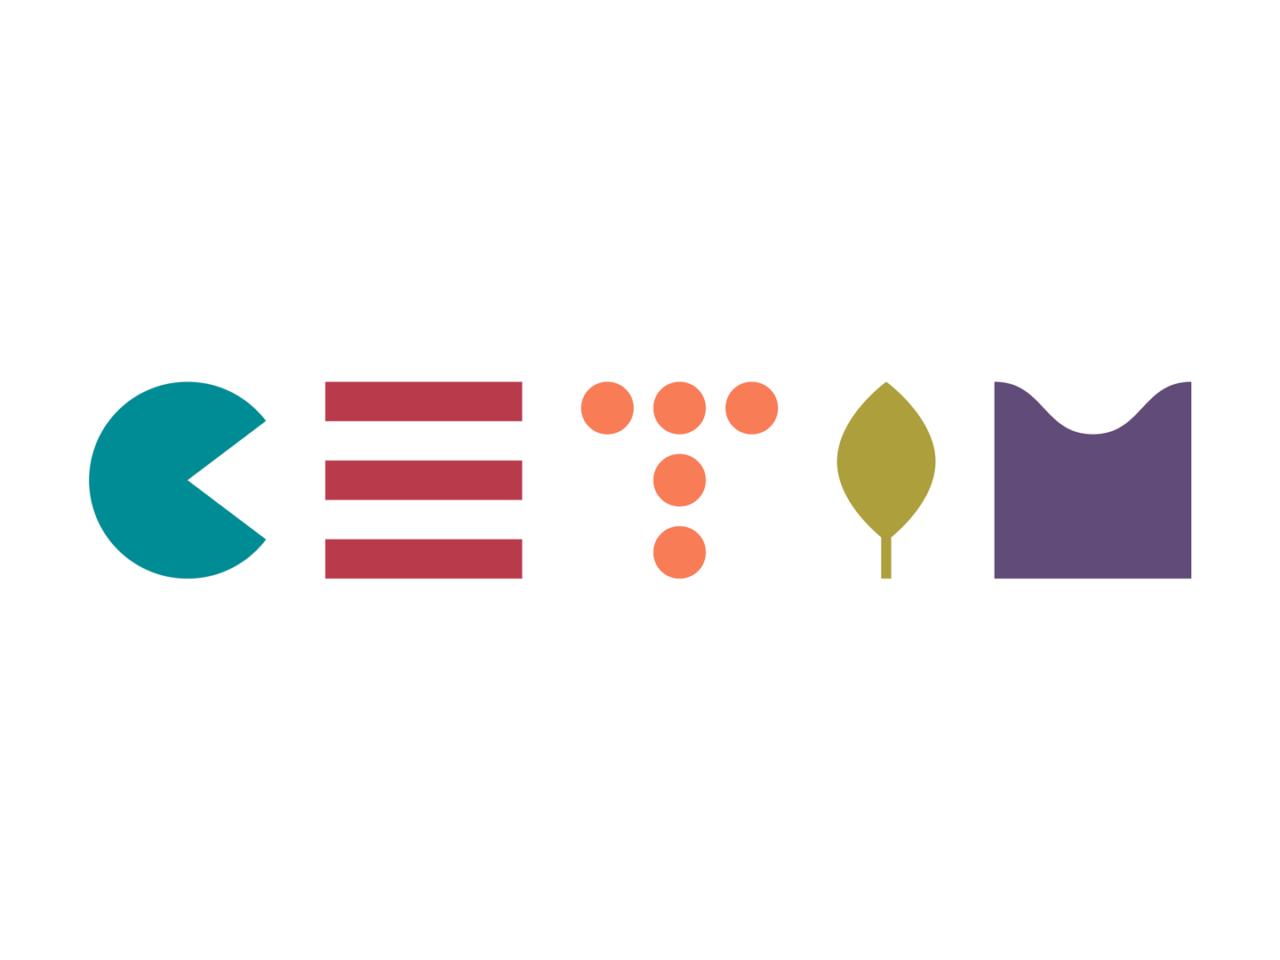 Identidade corporativa de CETIM 2